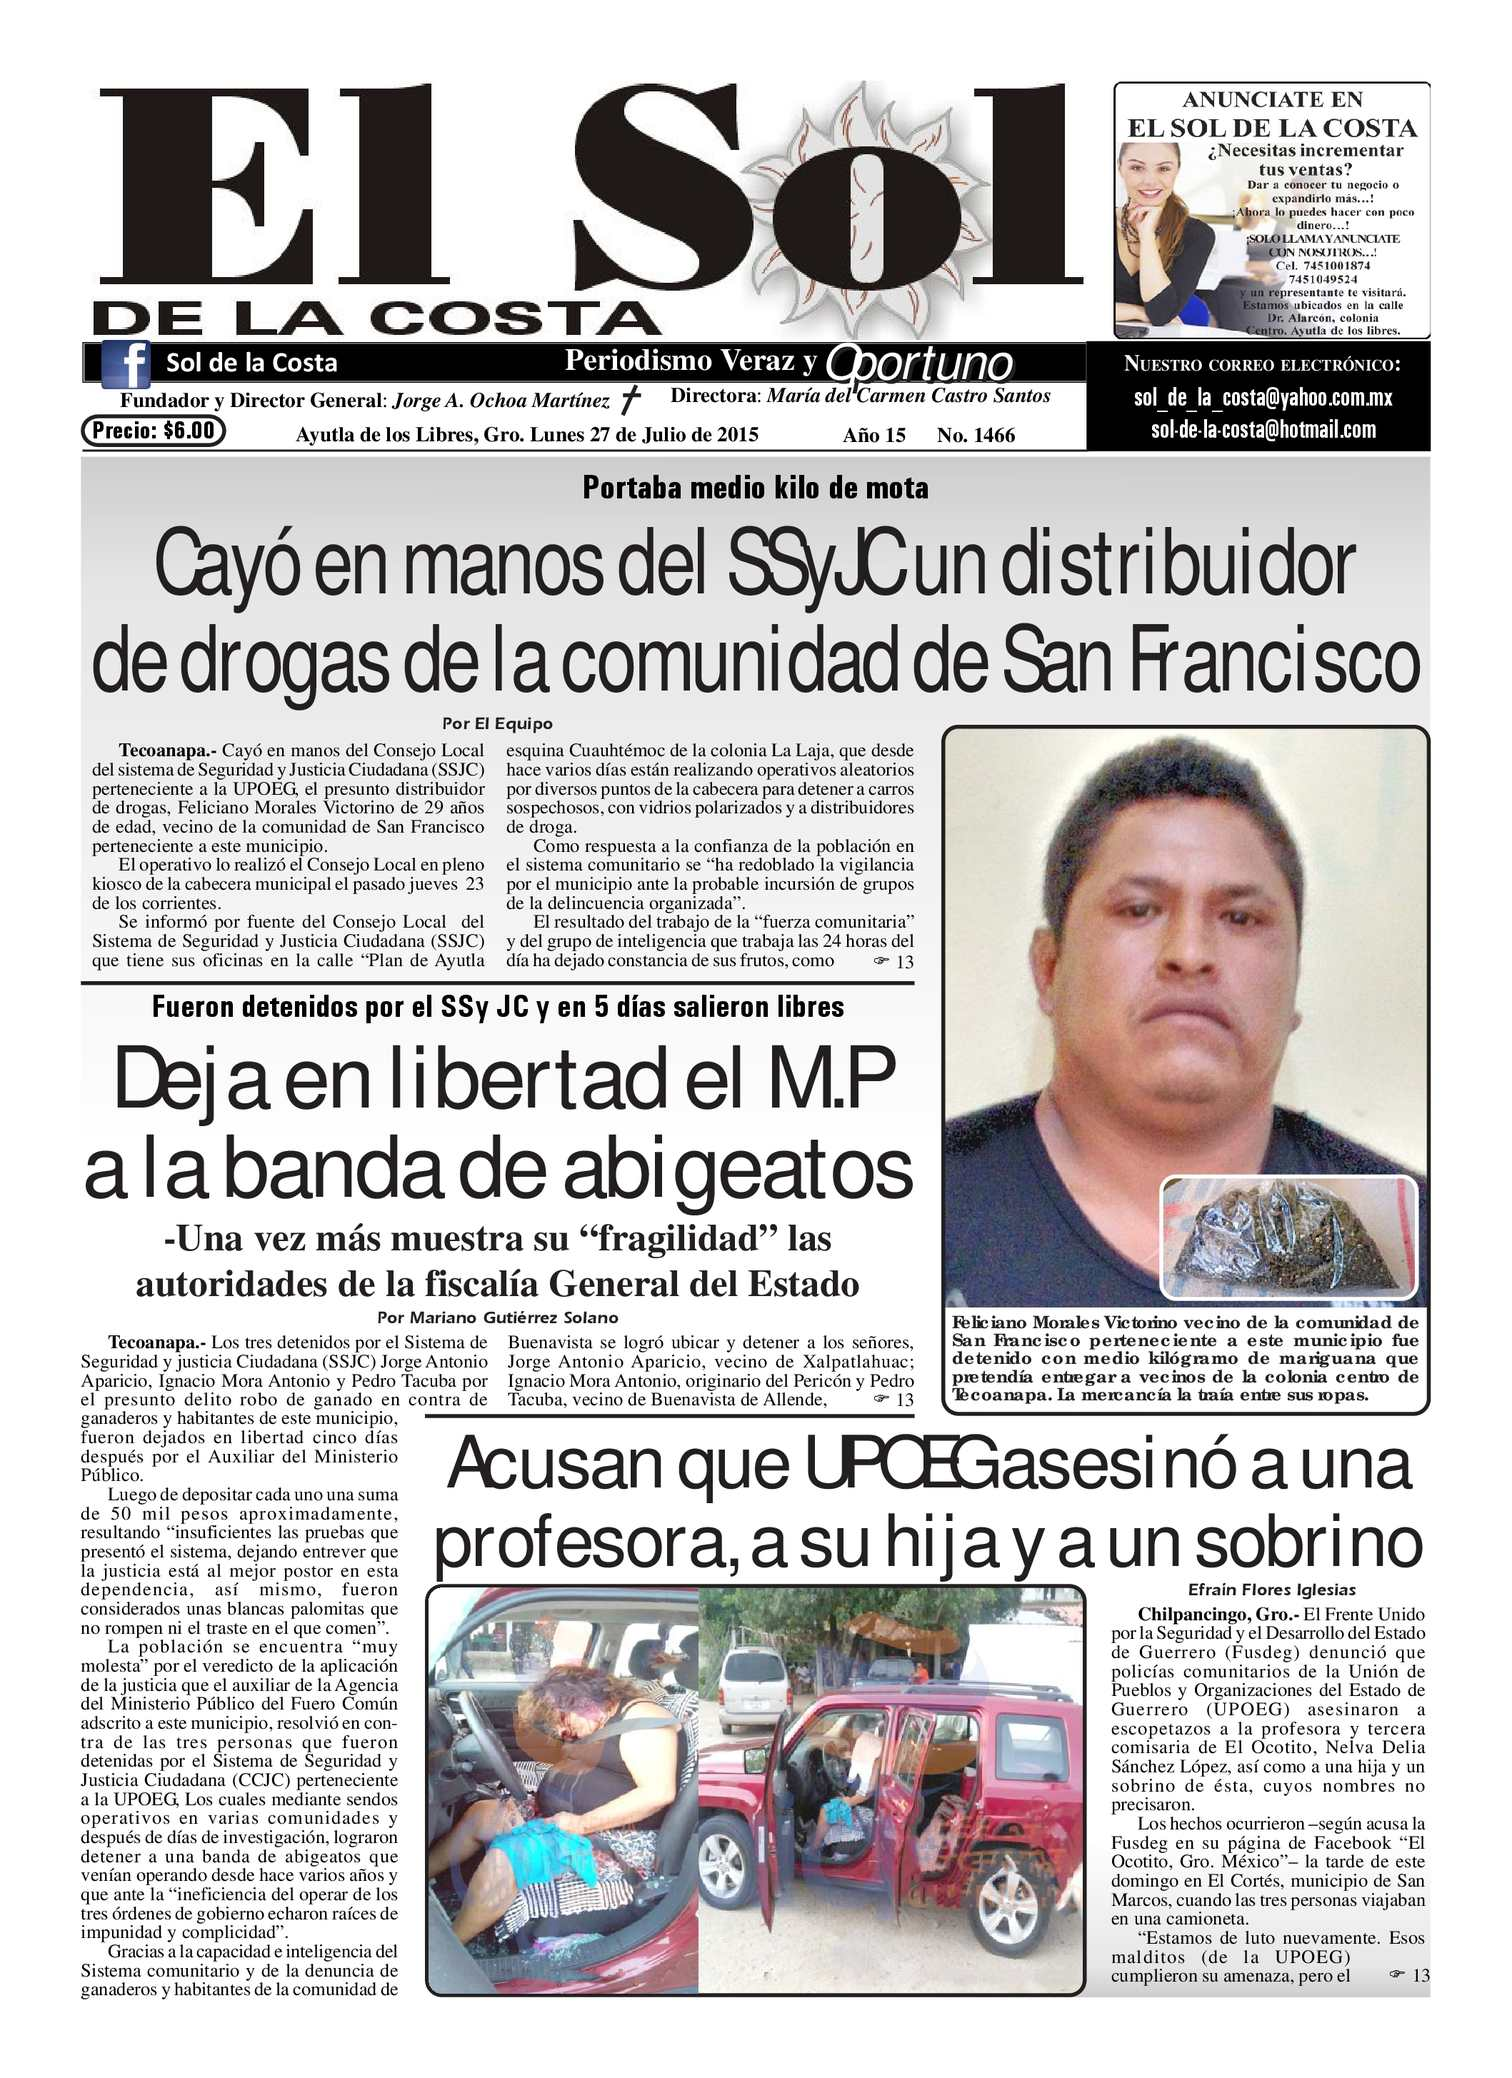 Carta democracia interamericana yahoo dating